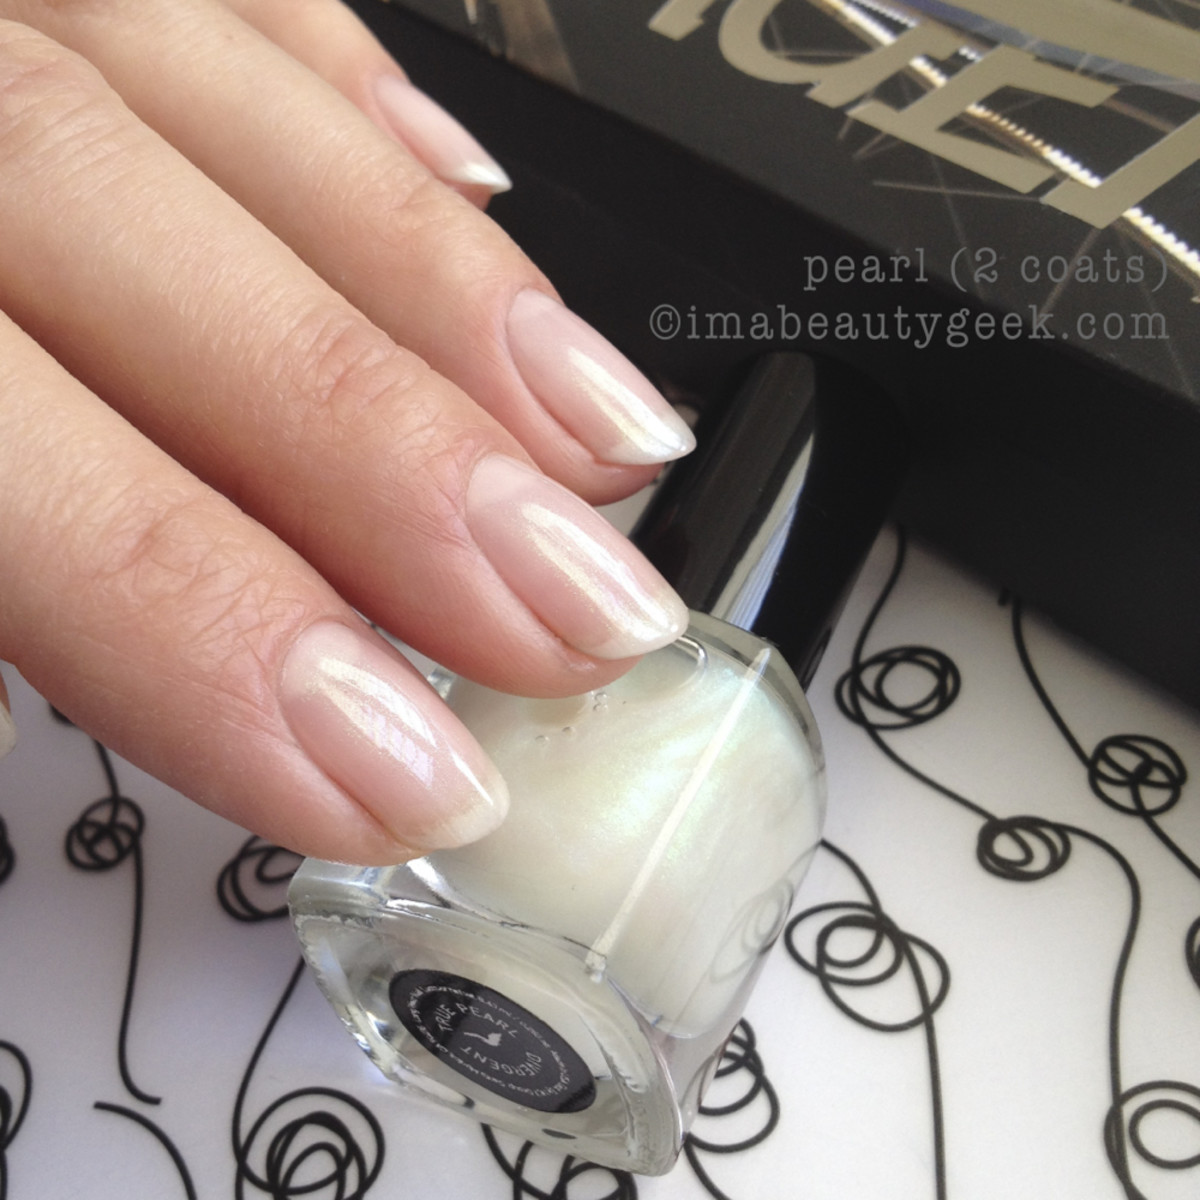 Divergent polish Pearl_Divergent Cosmetics